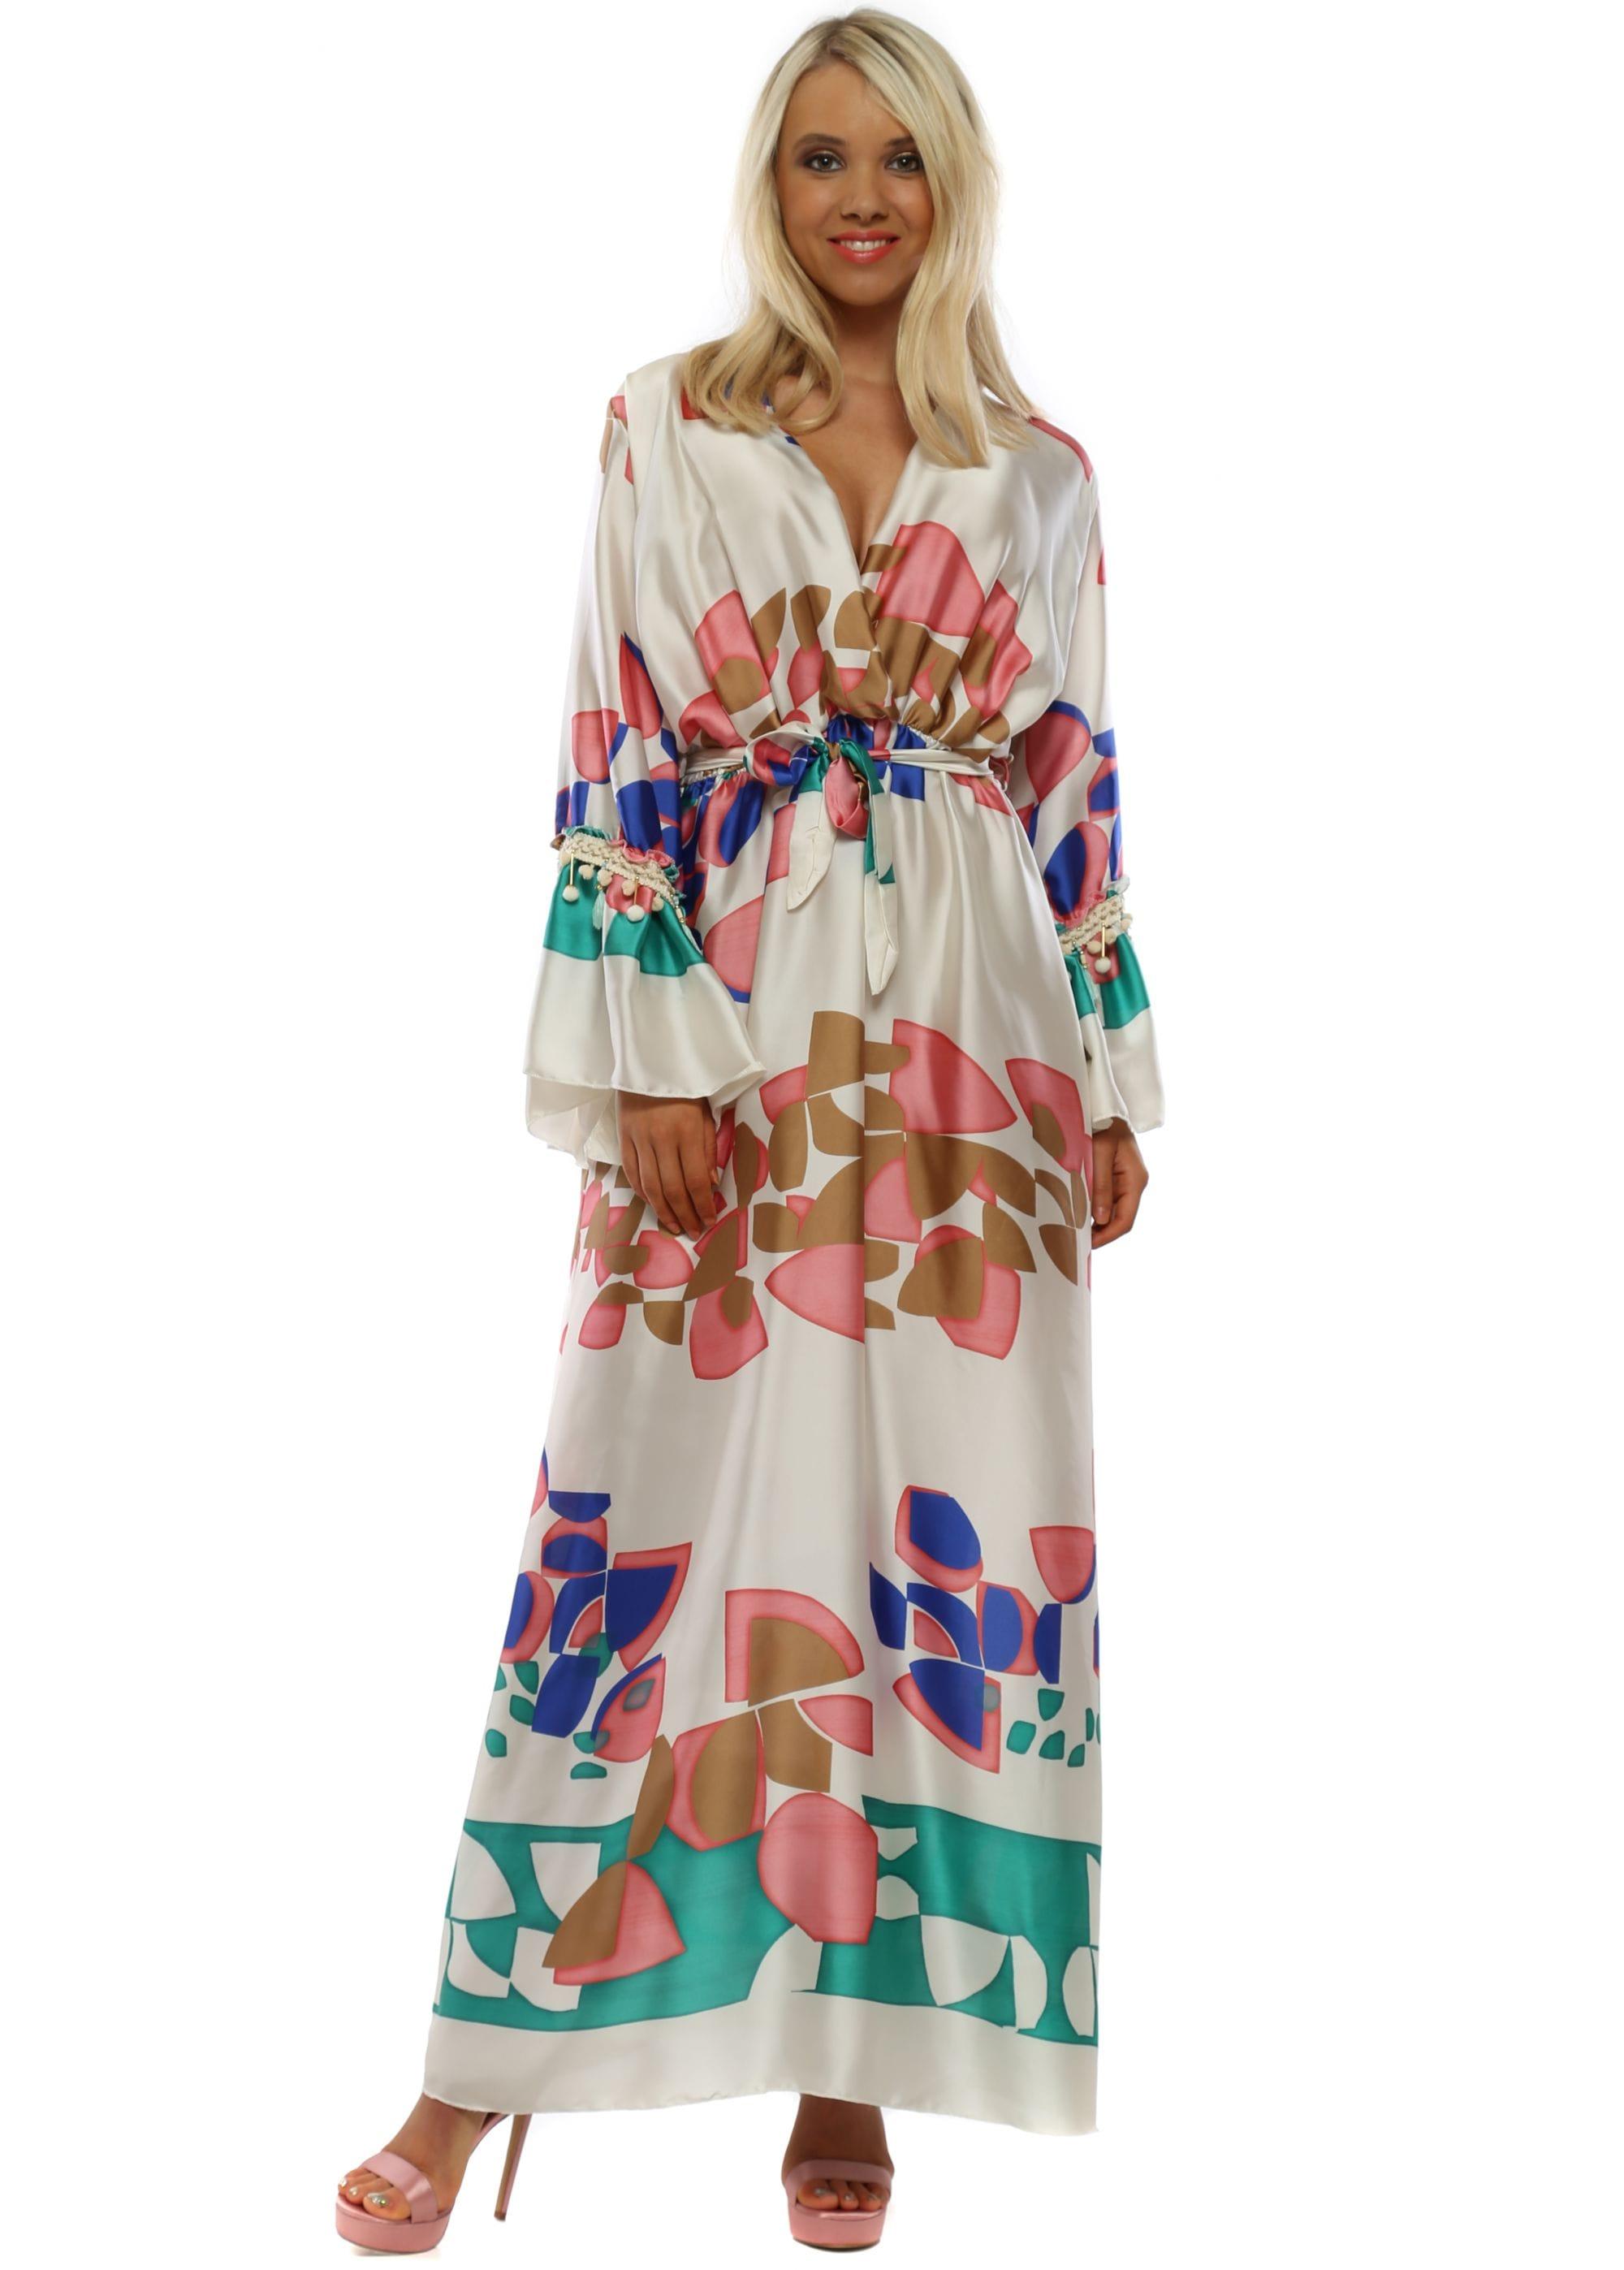 b6196ecc0e Port Boutique Dress | Floral Print Maxi Dress | Designer Desirables